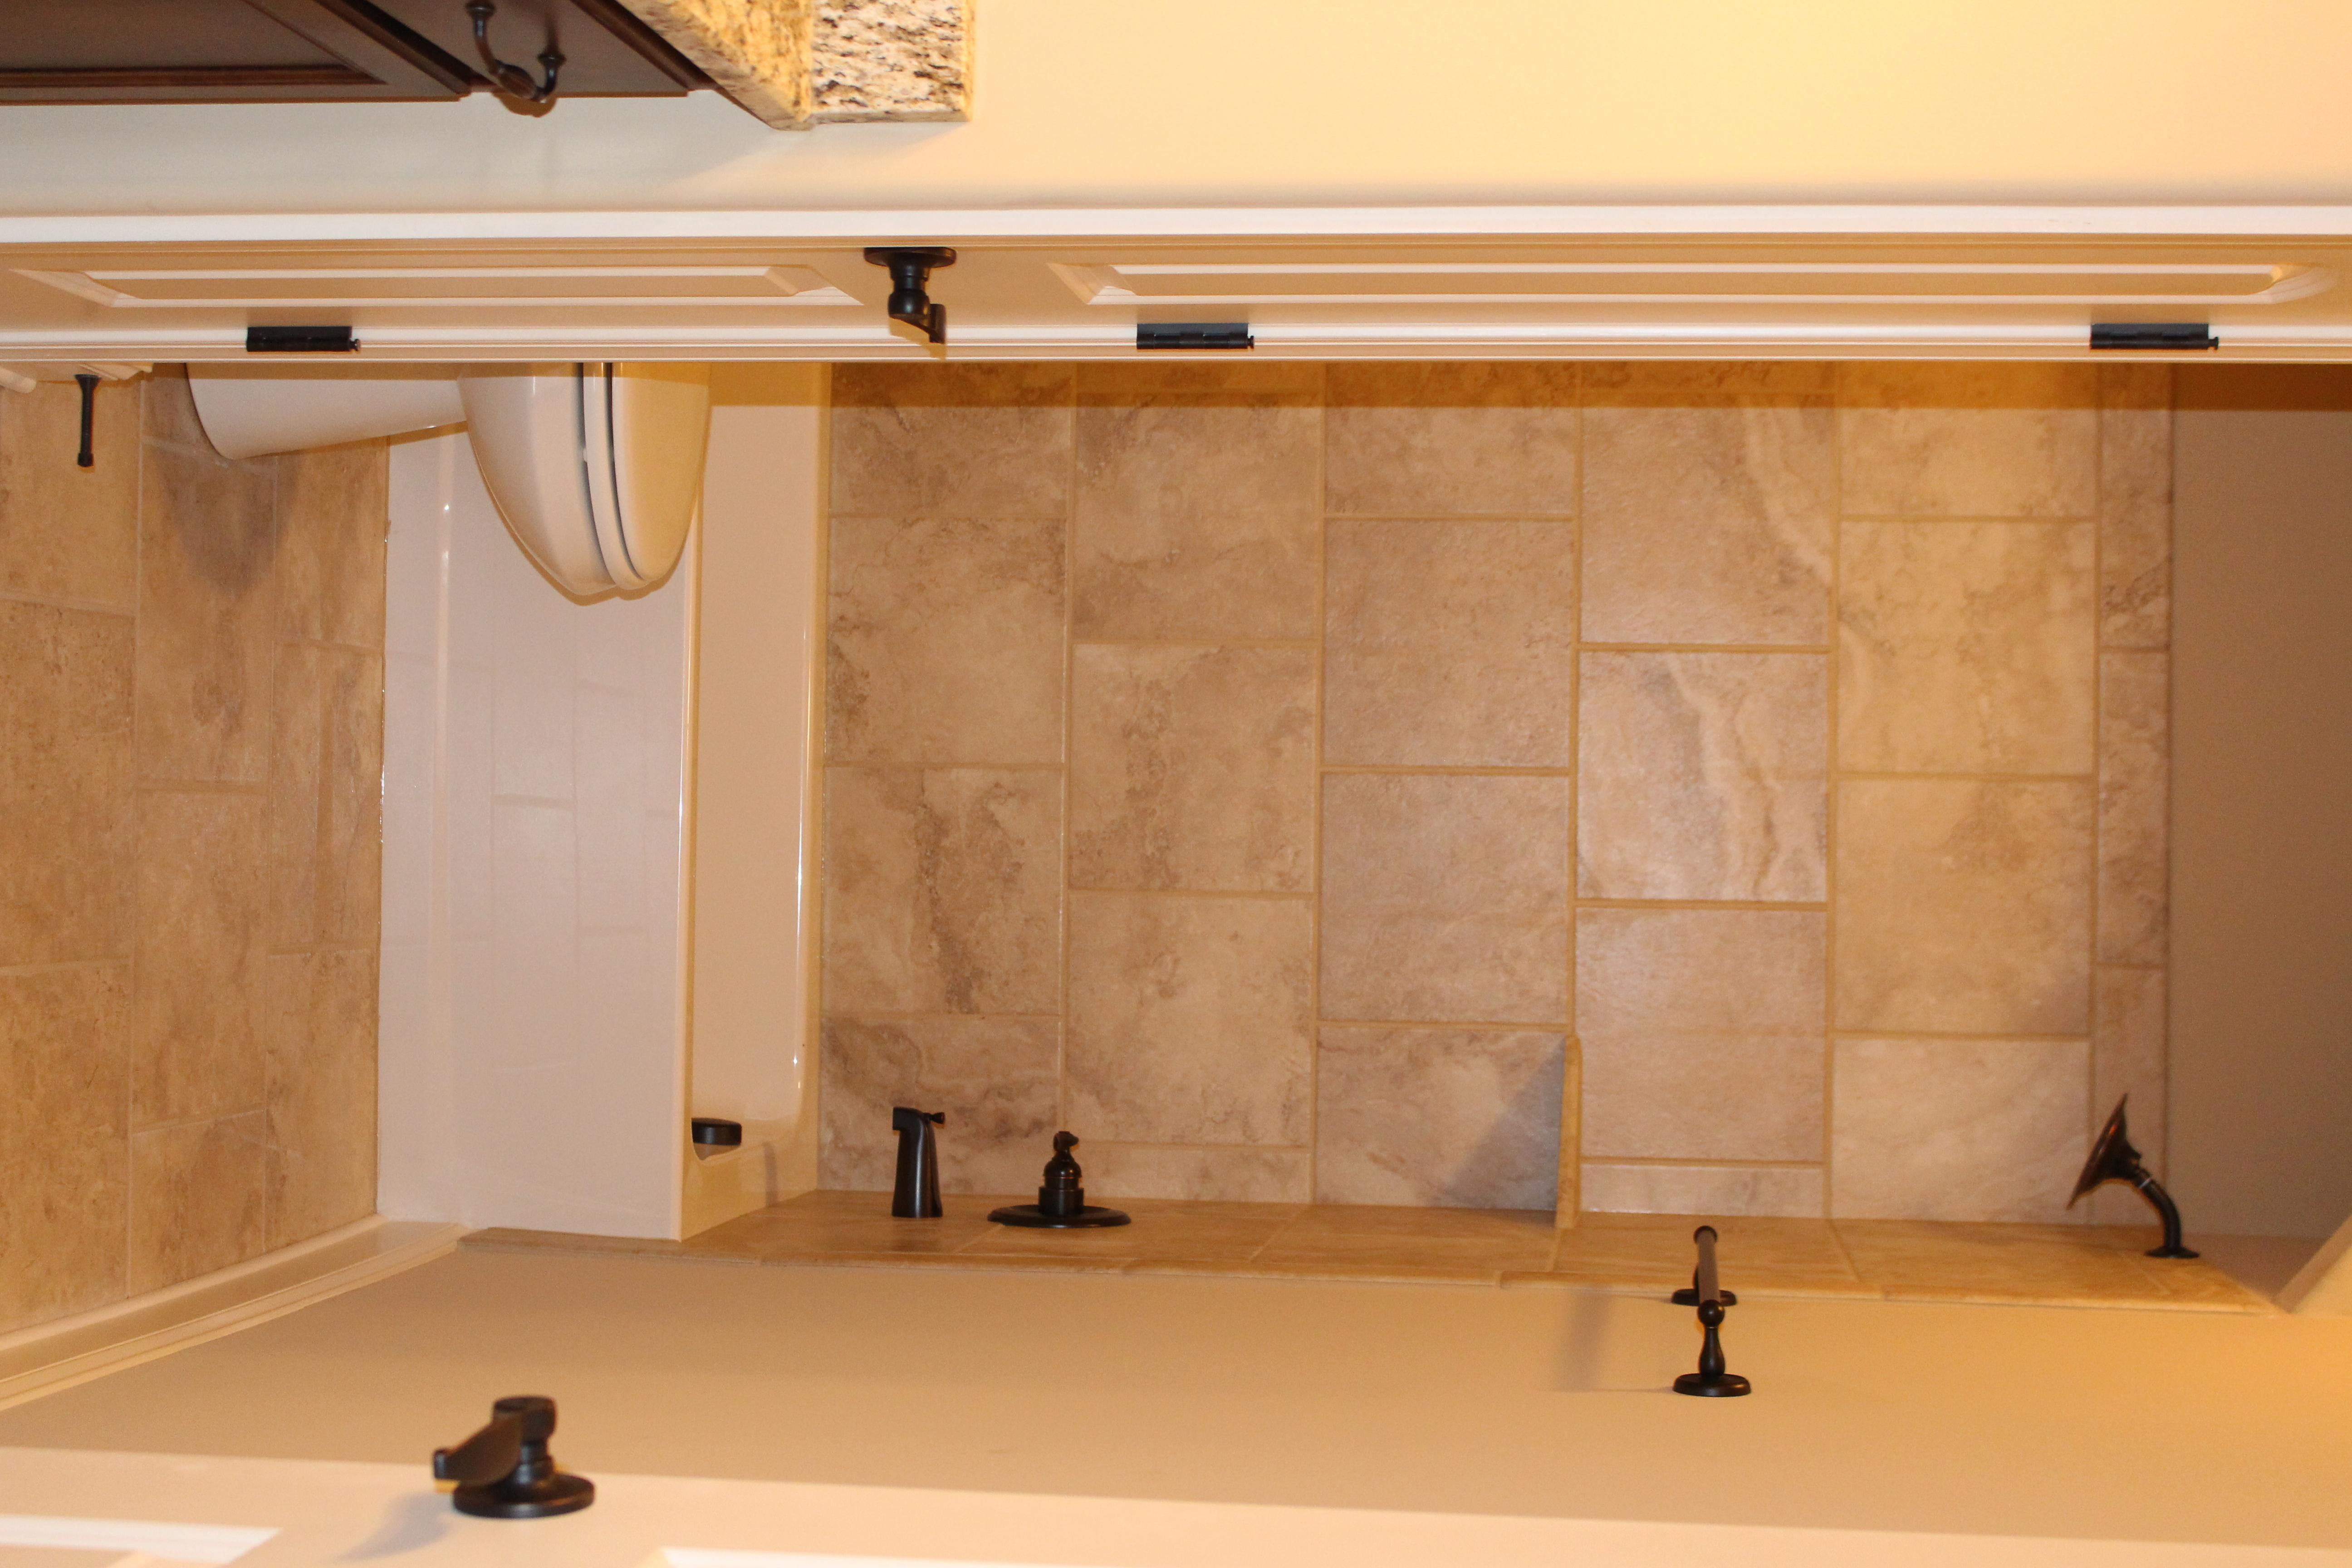 CG306-down bath shower